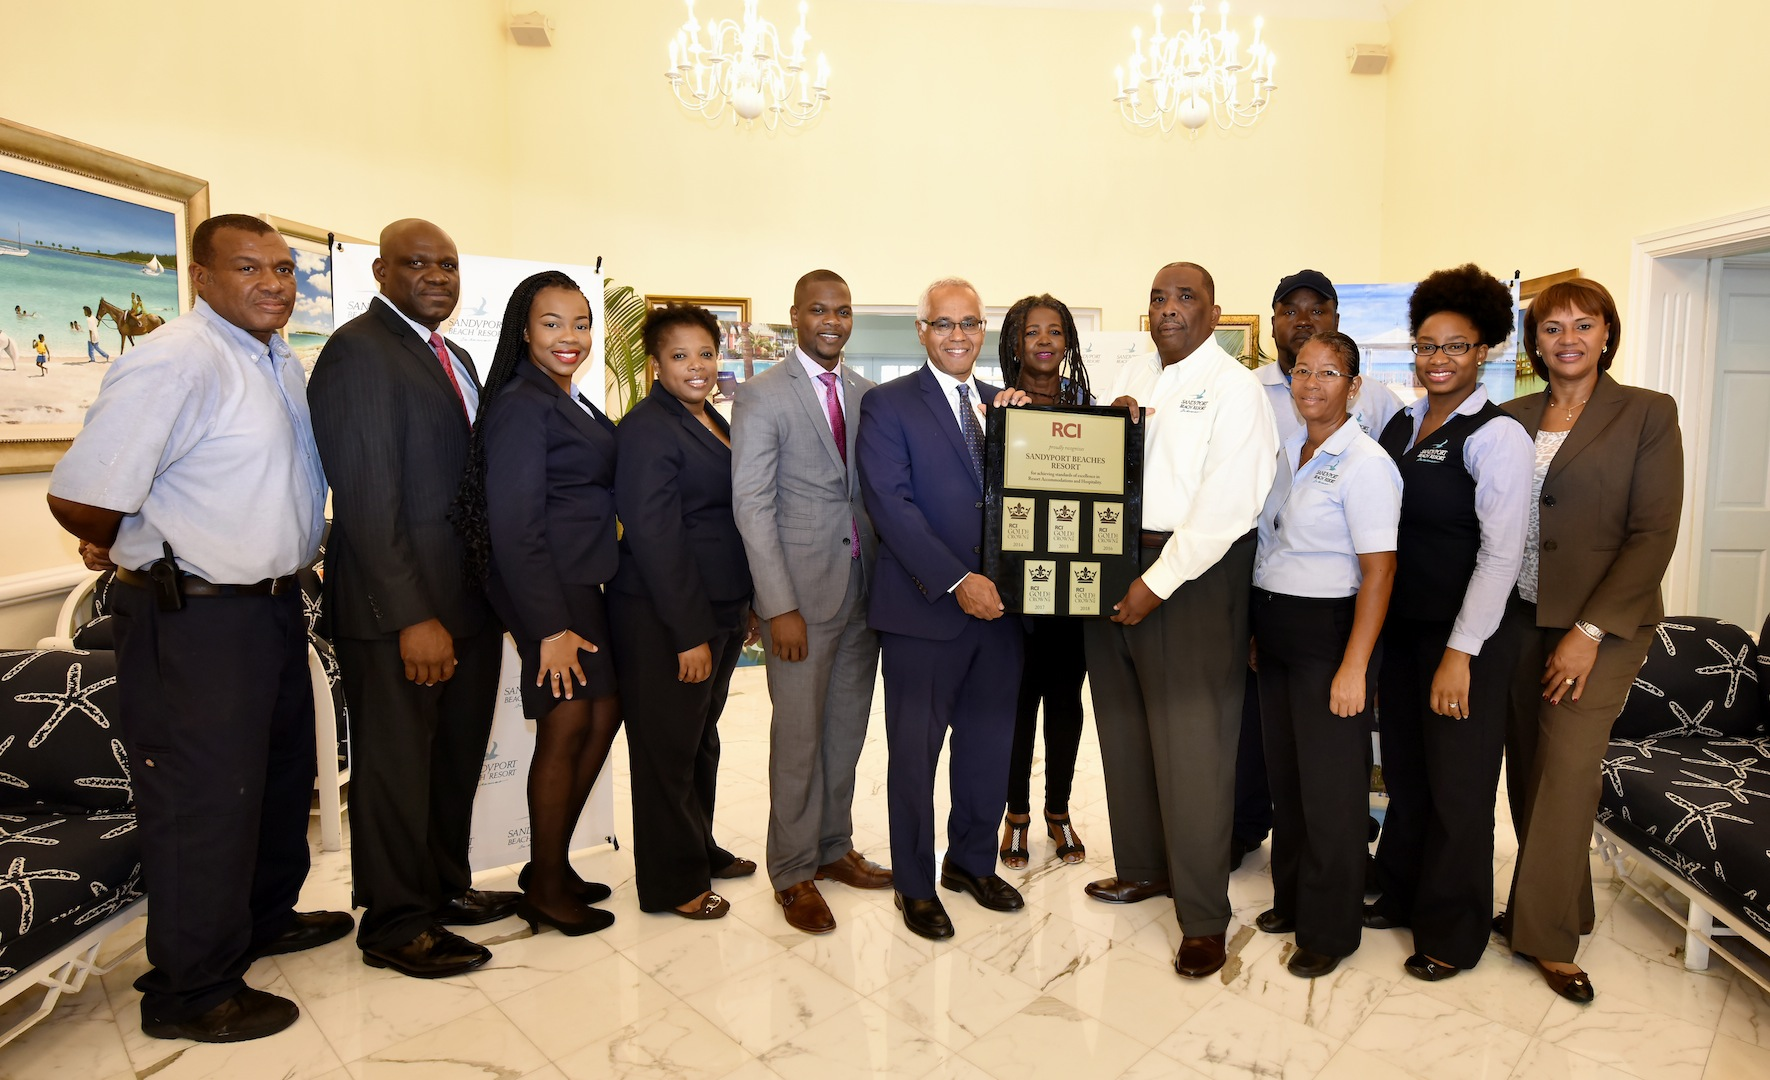 Minister D'Aguilar celebrates Sandyport Beach Resort's TripAdvisor and RCI Top Awards